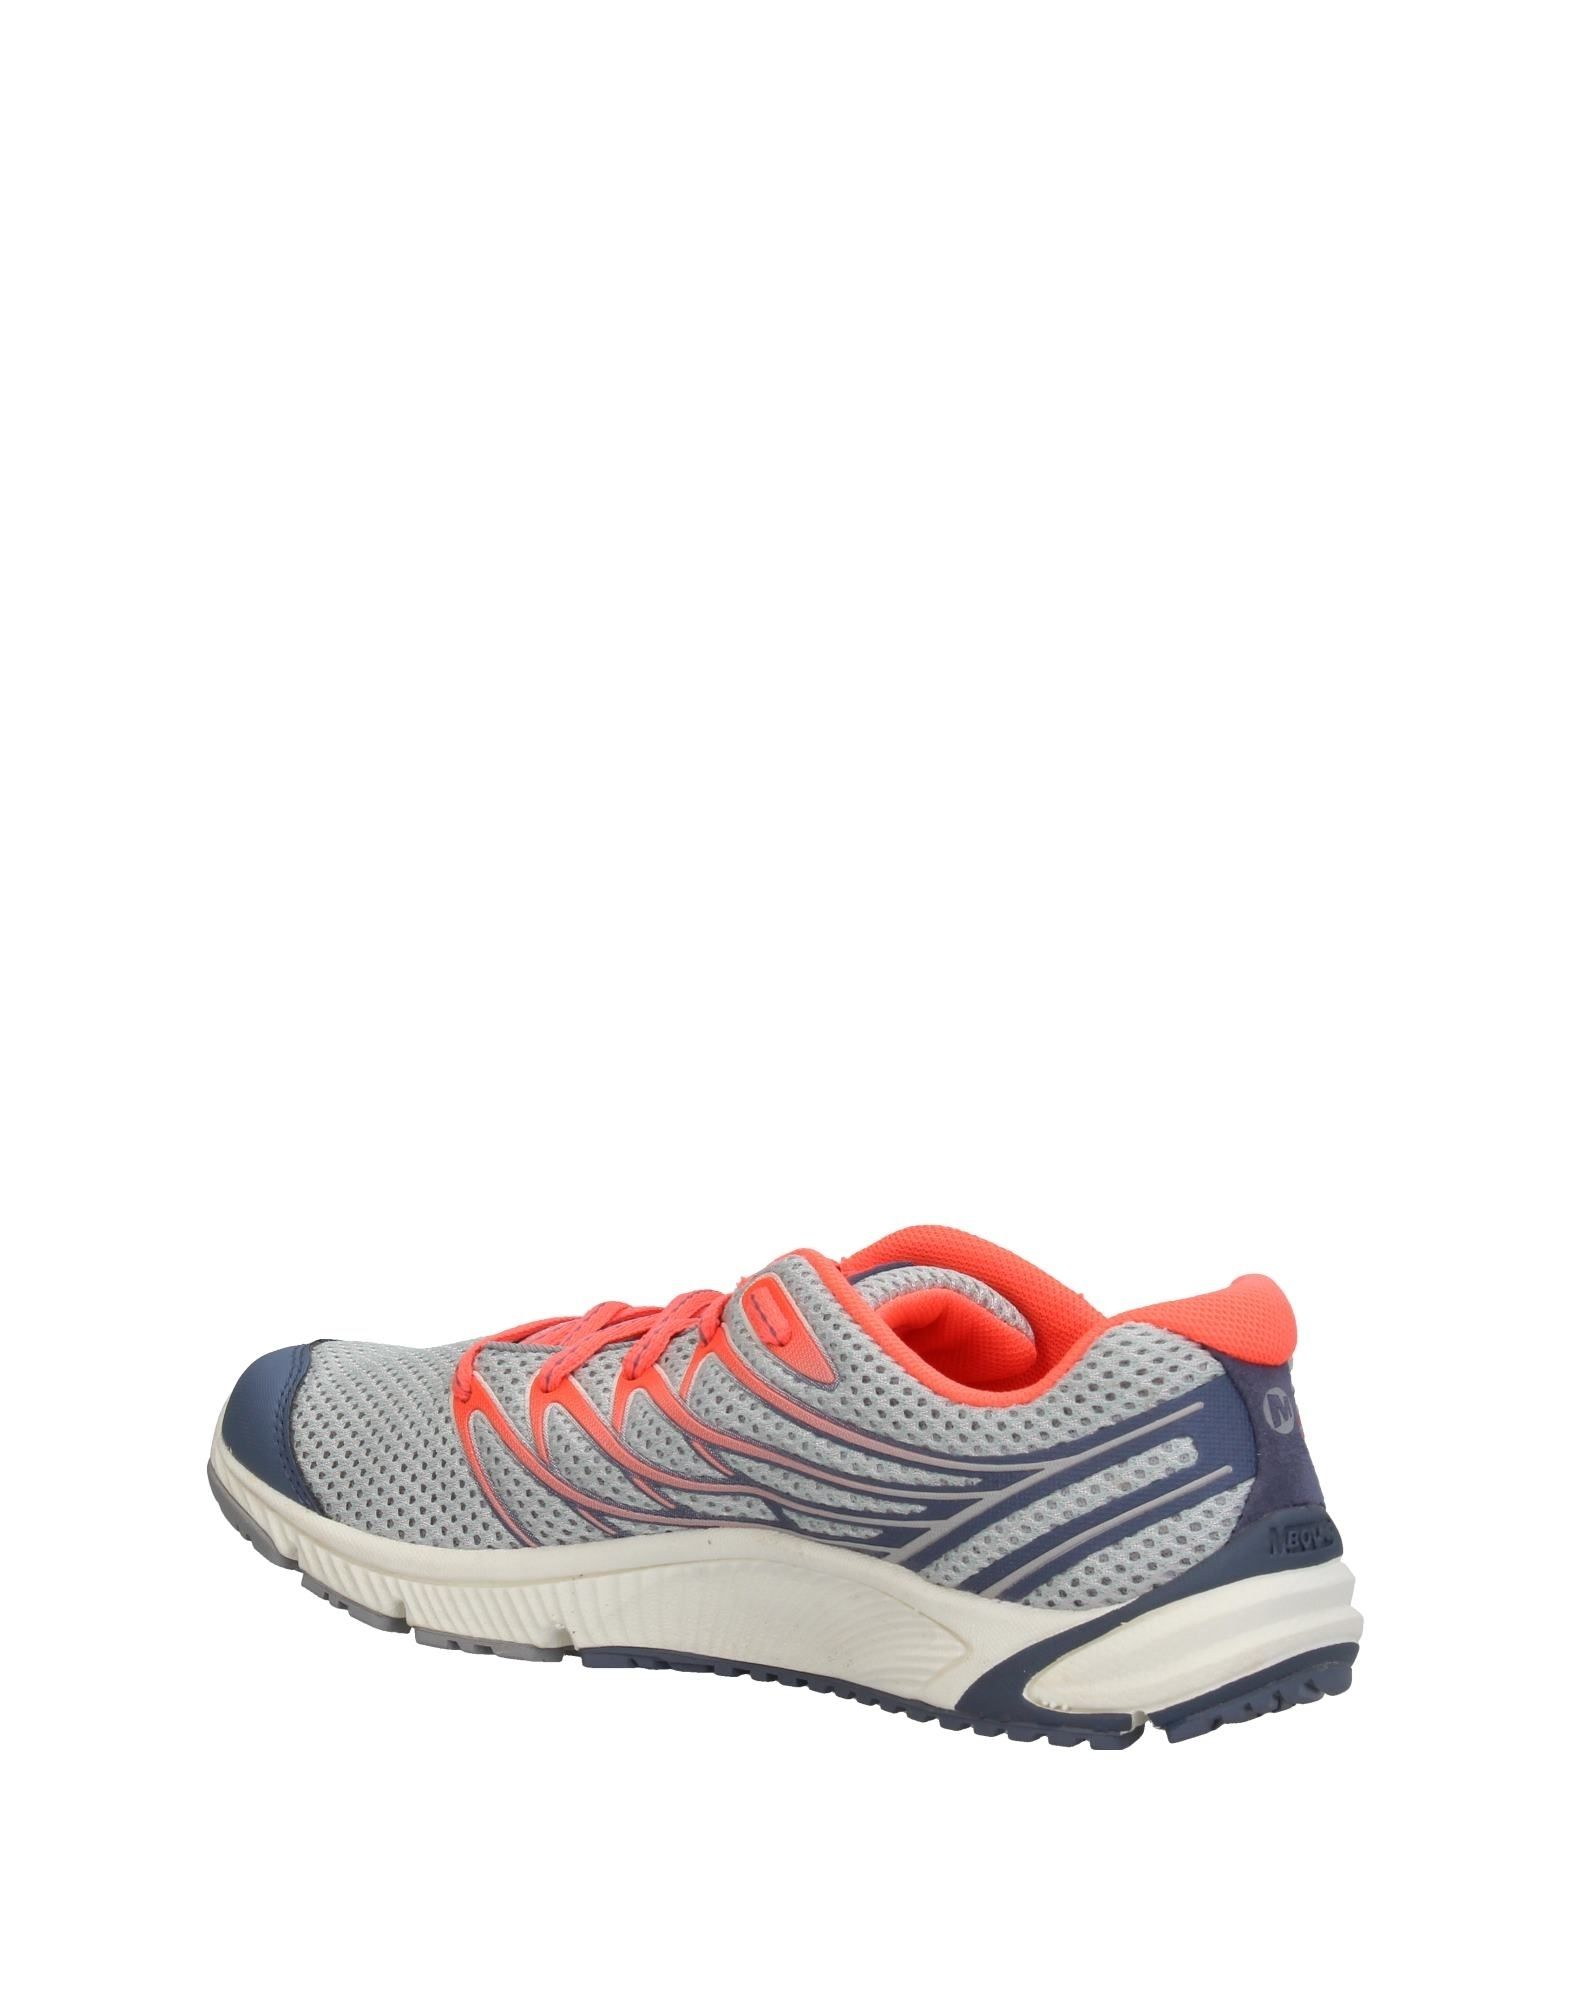 Sneakers Merrell Femme - Sneakers Merrell sur